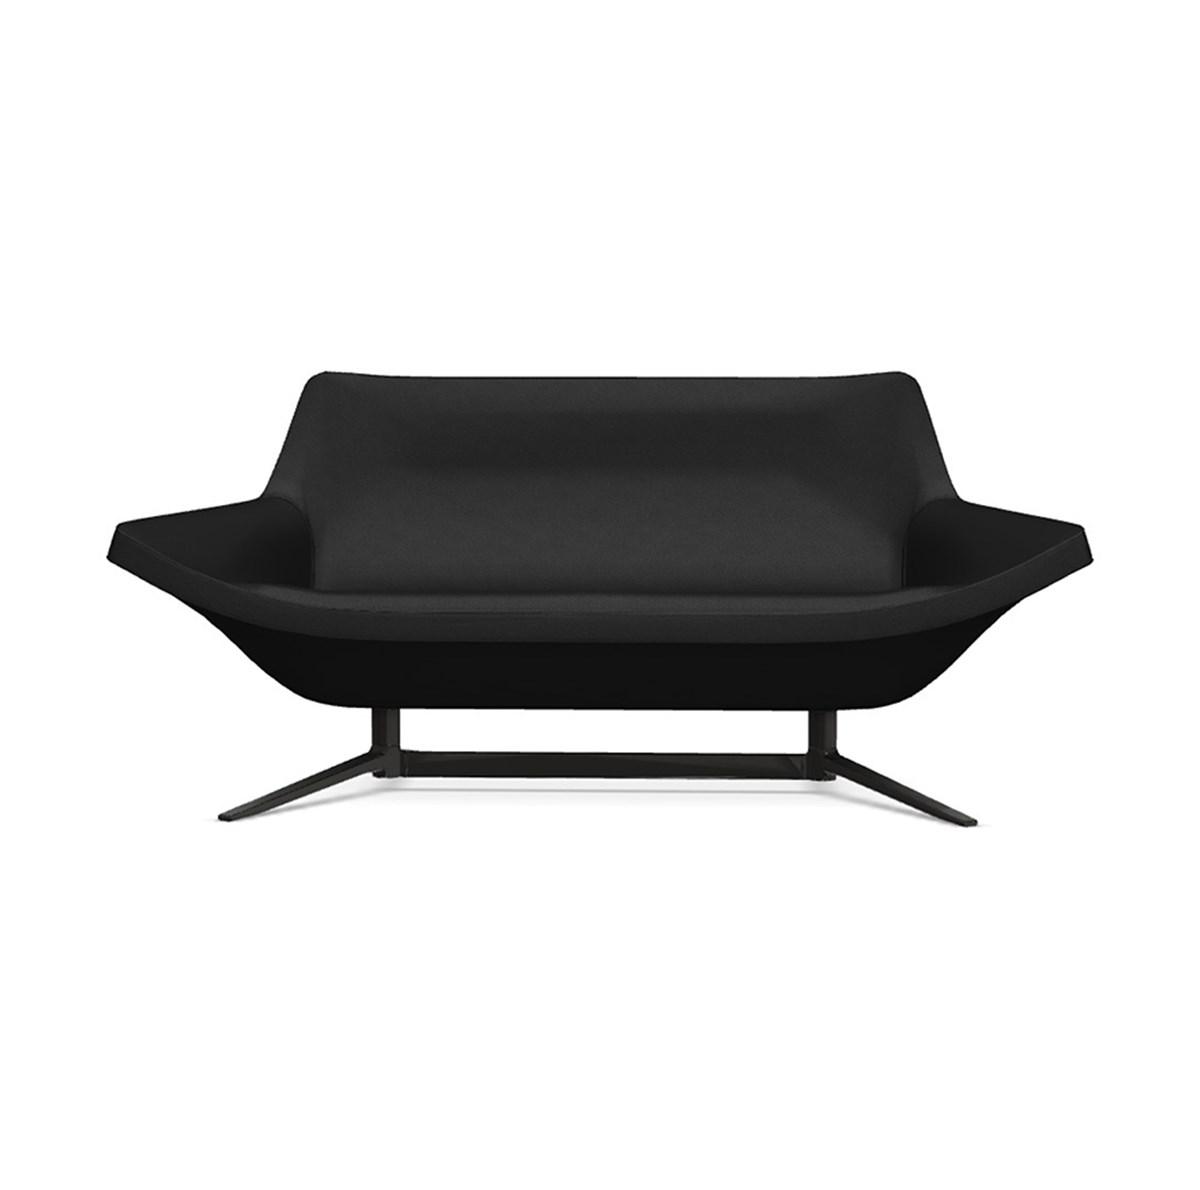 B&B-Italia-Jeffrey-Bernett-Metropolitan-'14-Sofa-Matisse-1